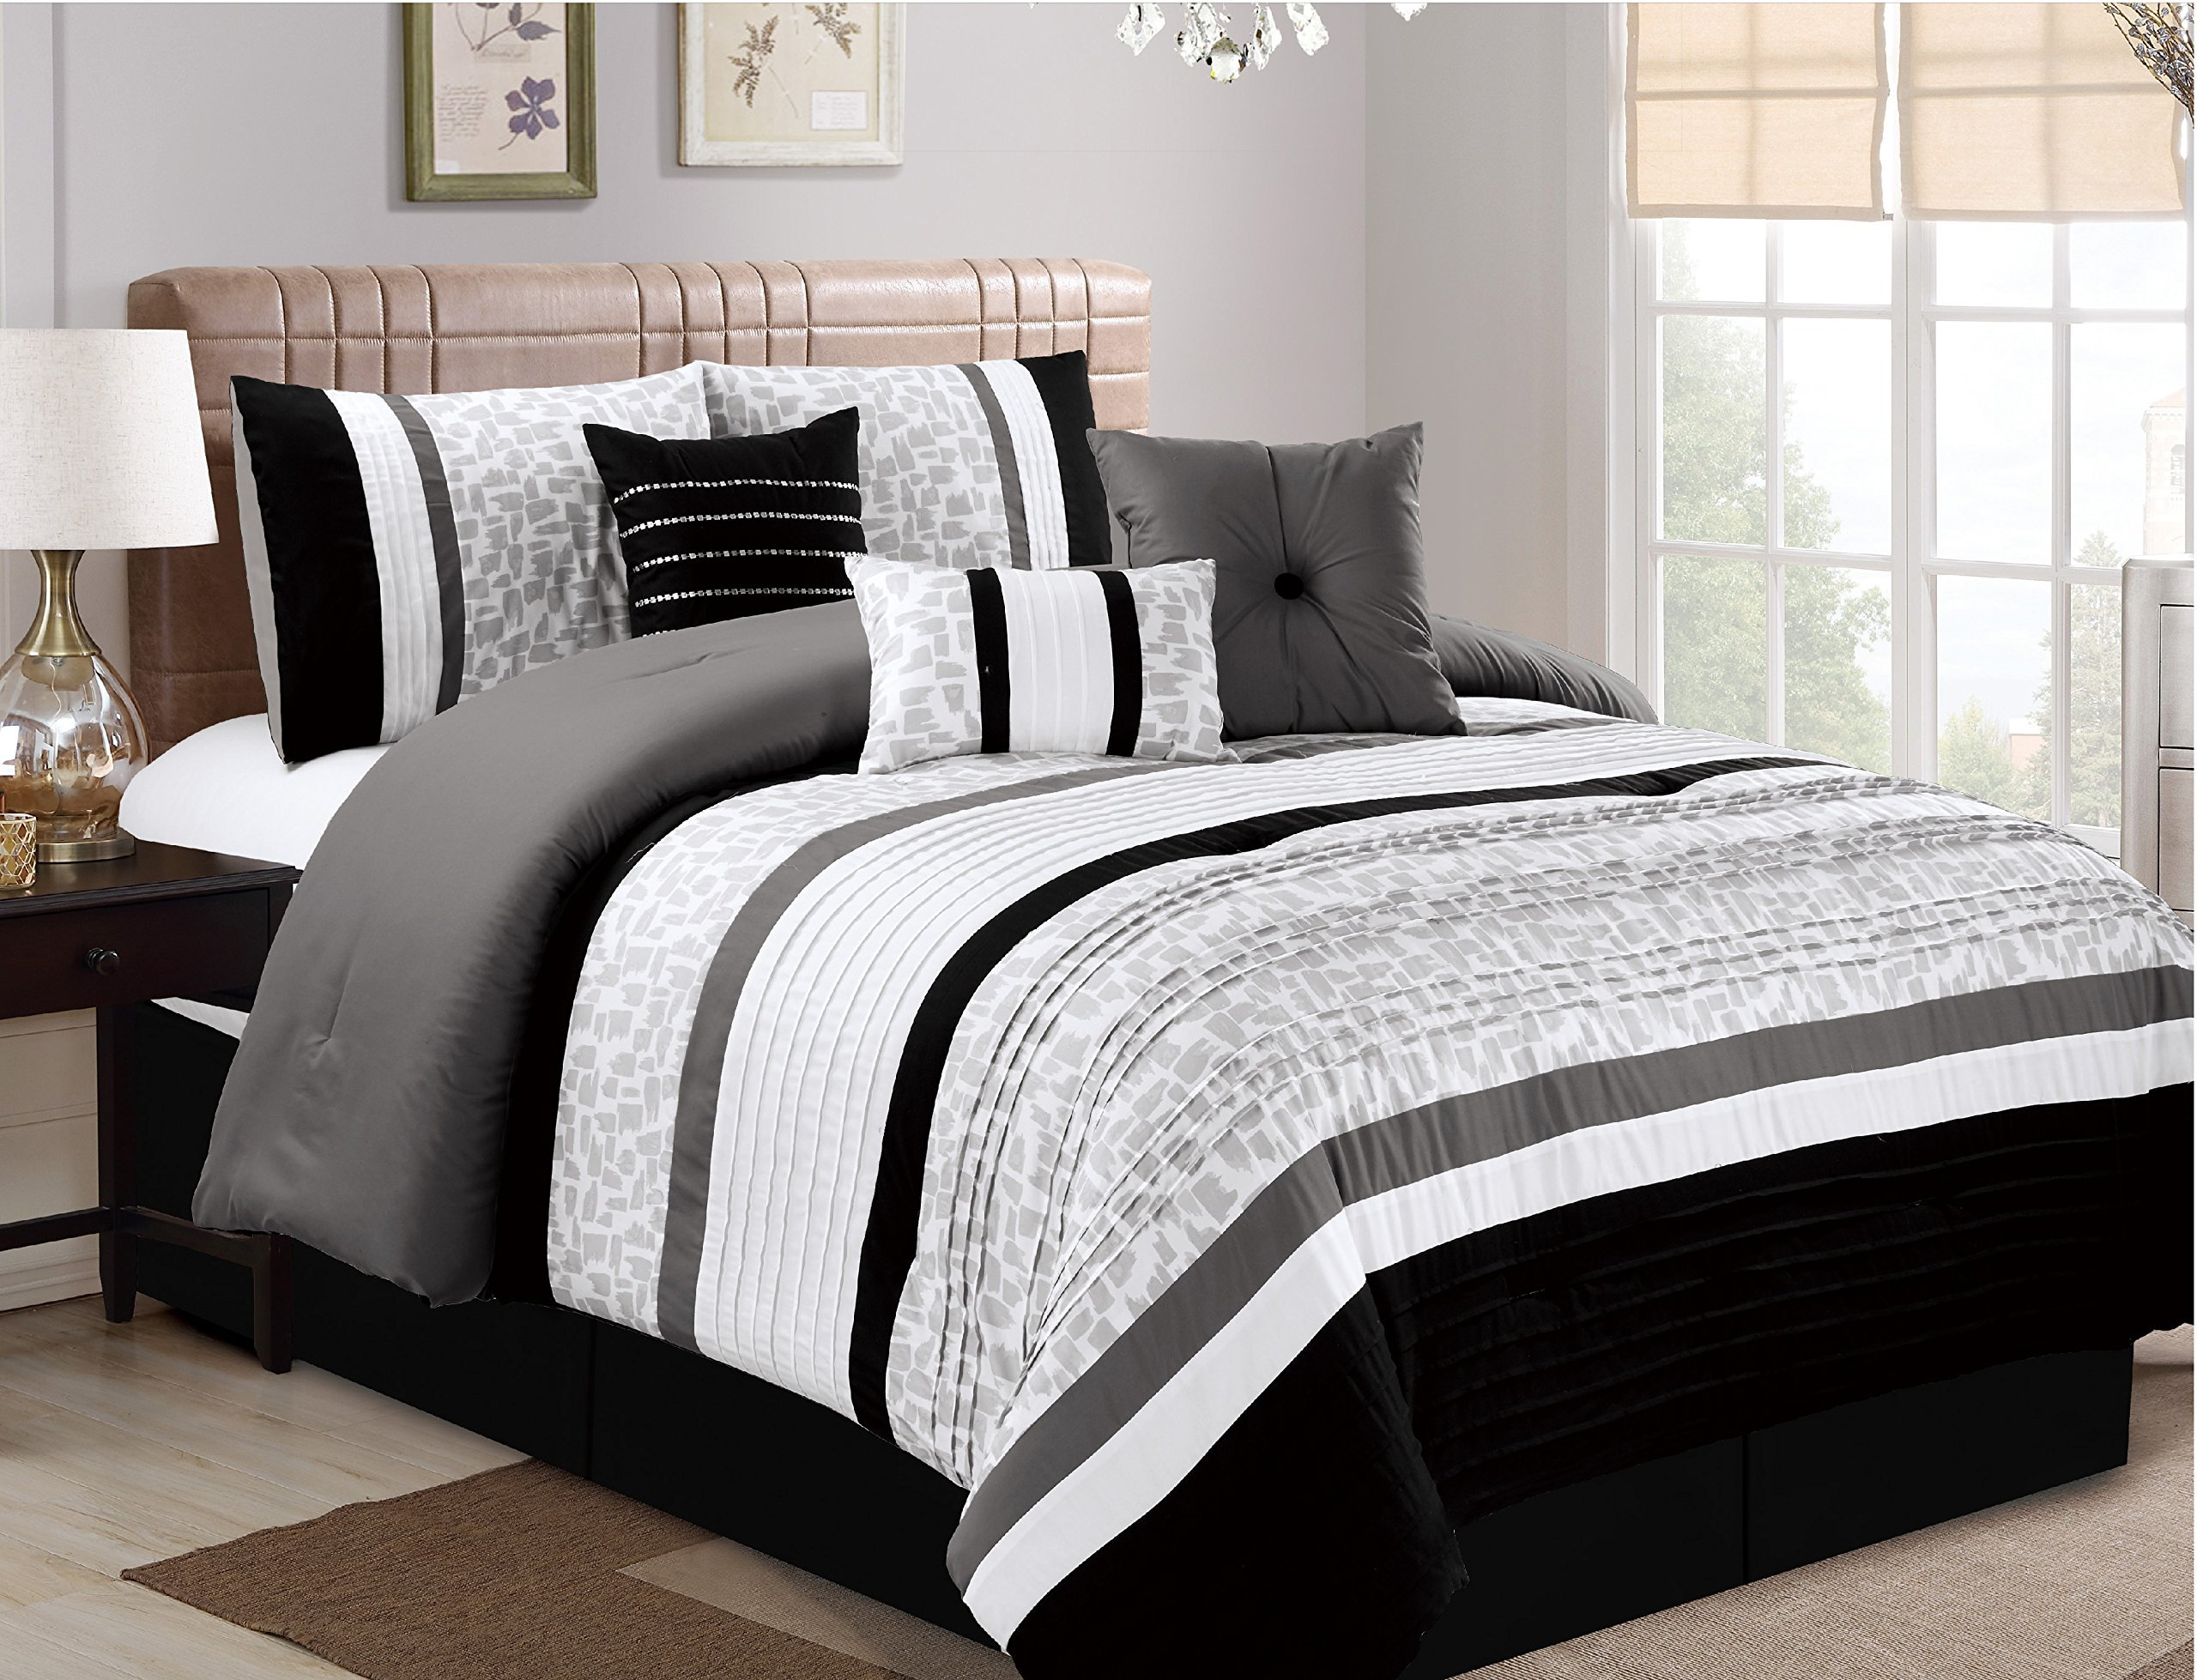 JBFF 7 Piece Oversize Luxury Stripe Bed in Bag Microfiber Comforter Set, Black, King